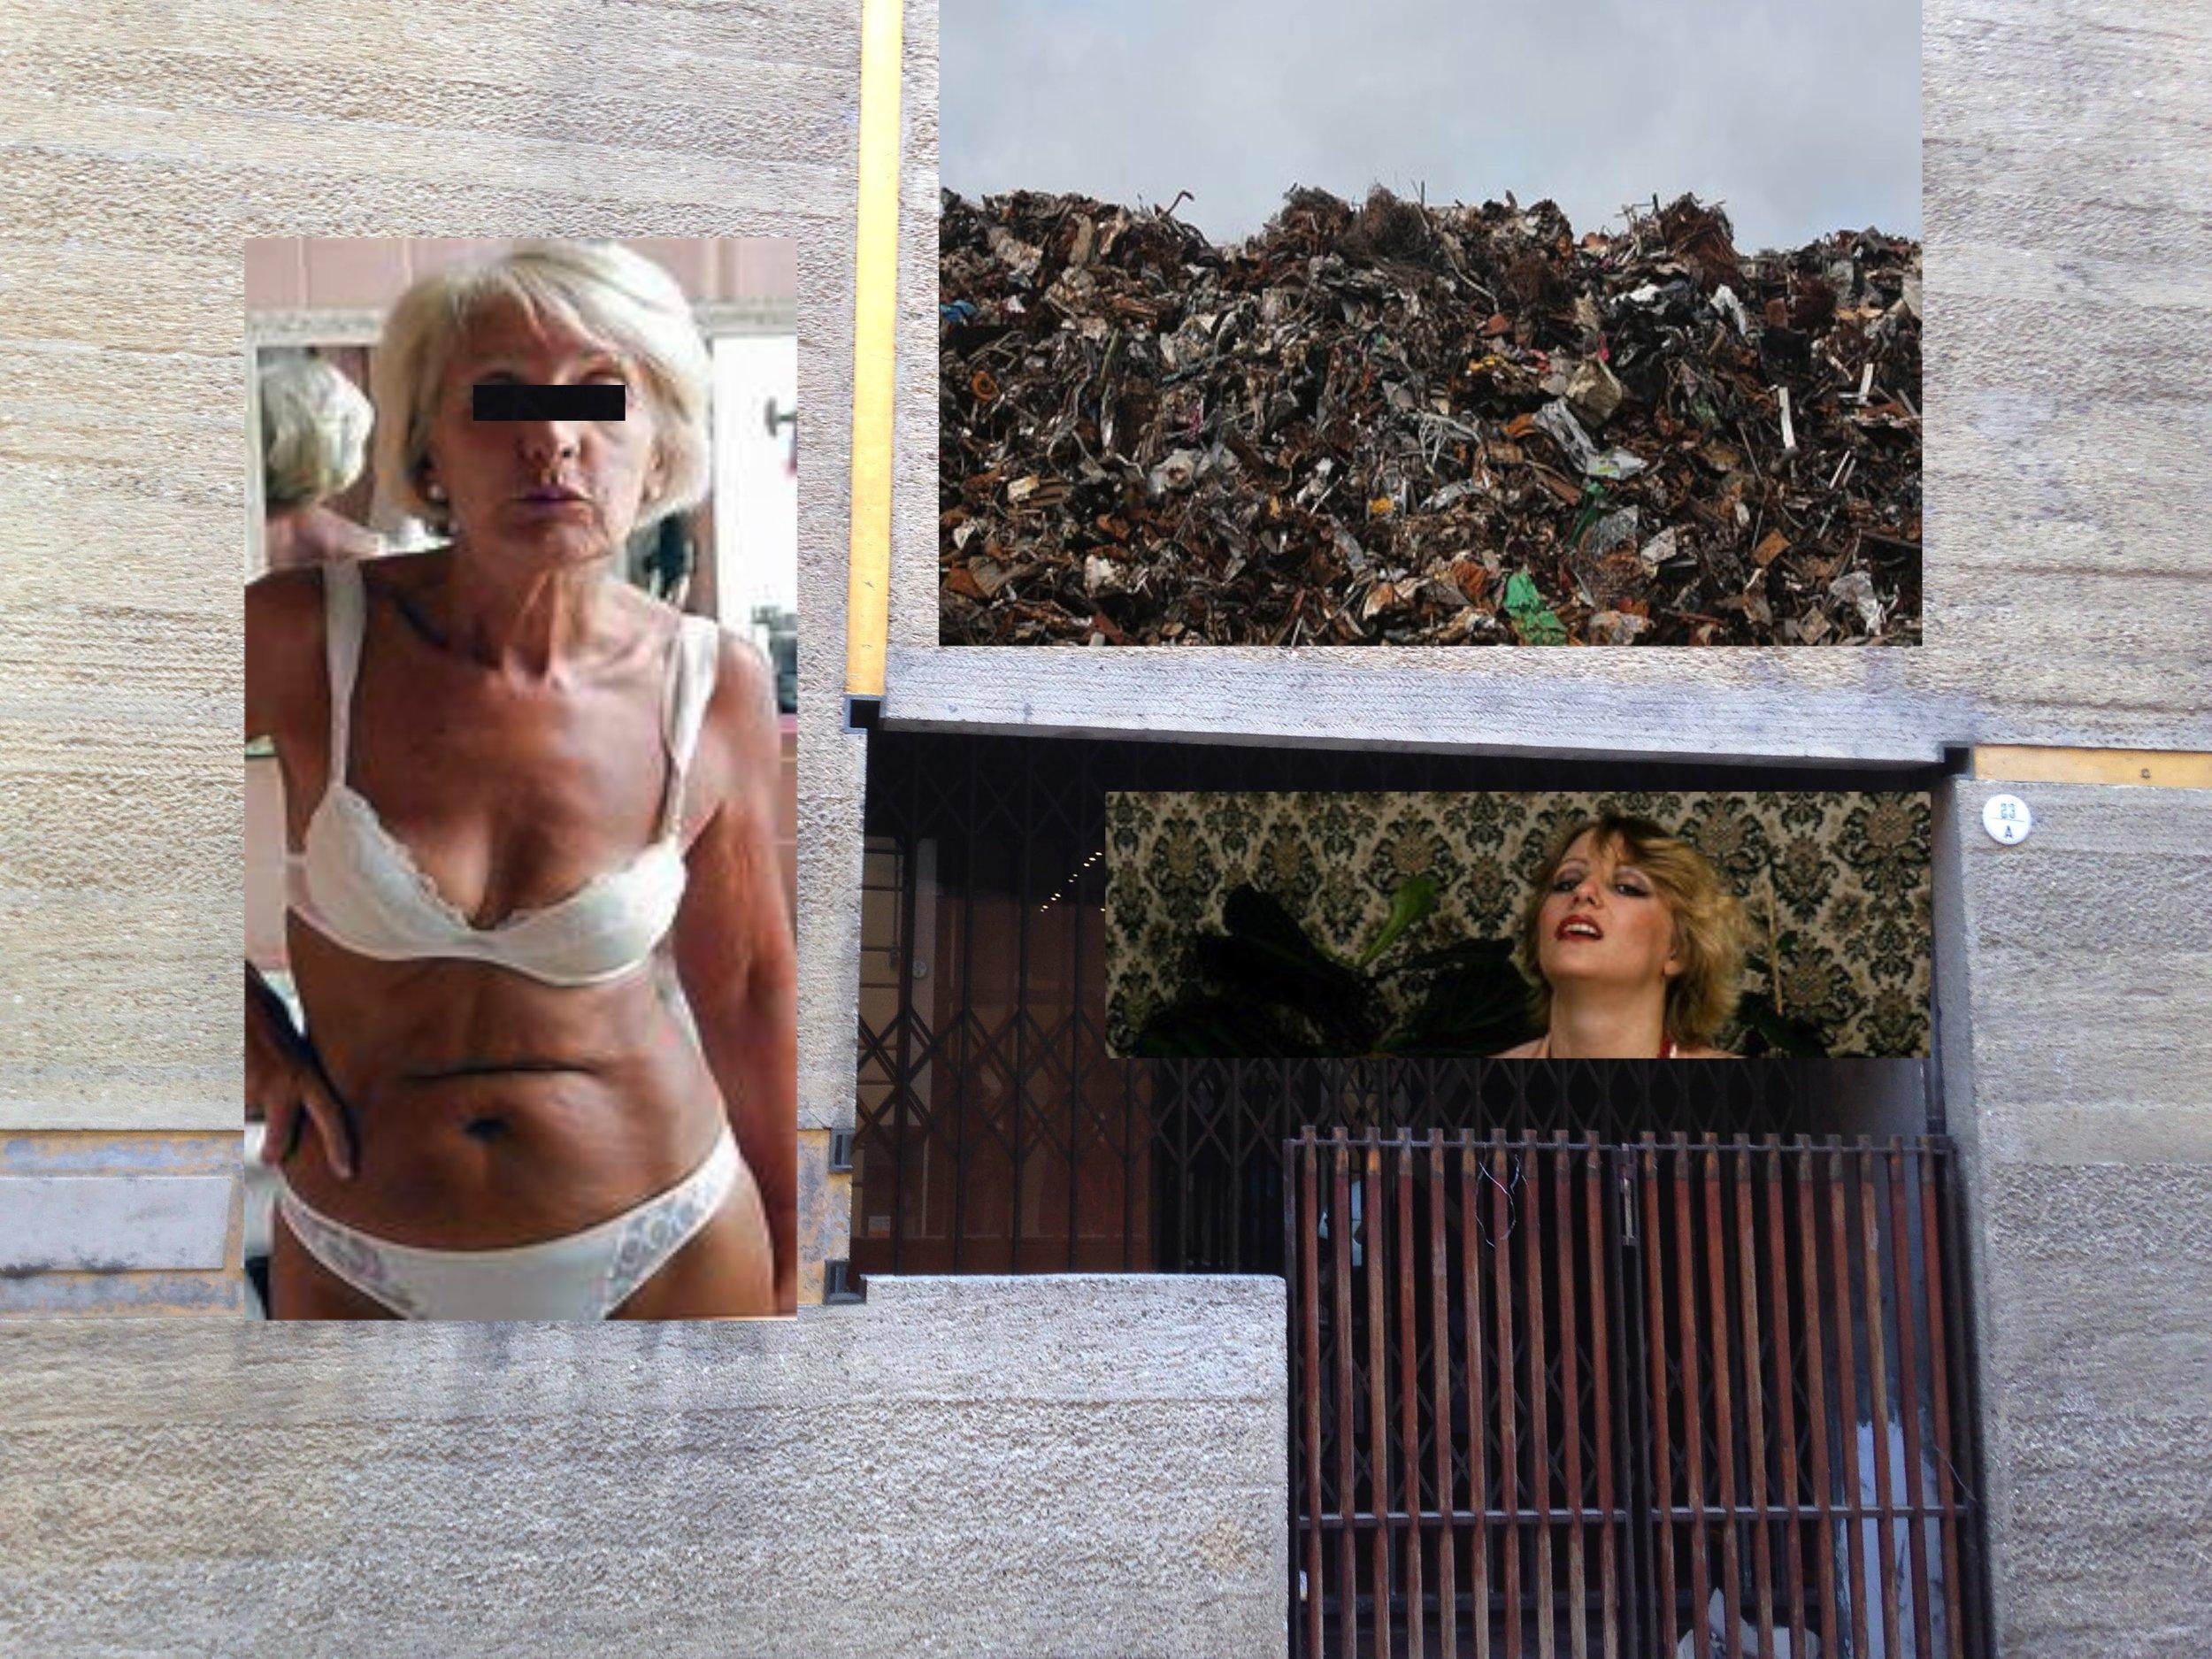 door:bologna garbage.jpg